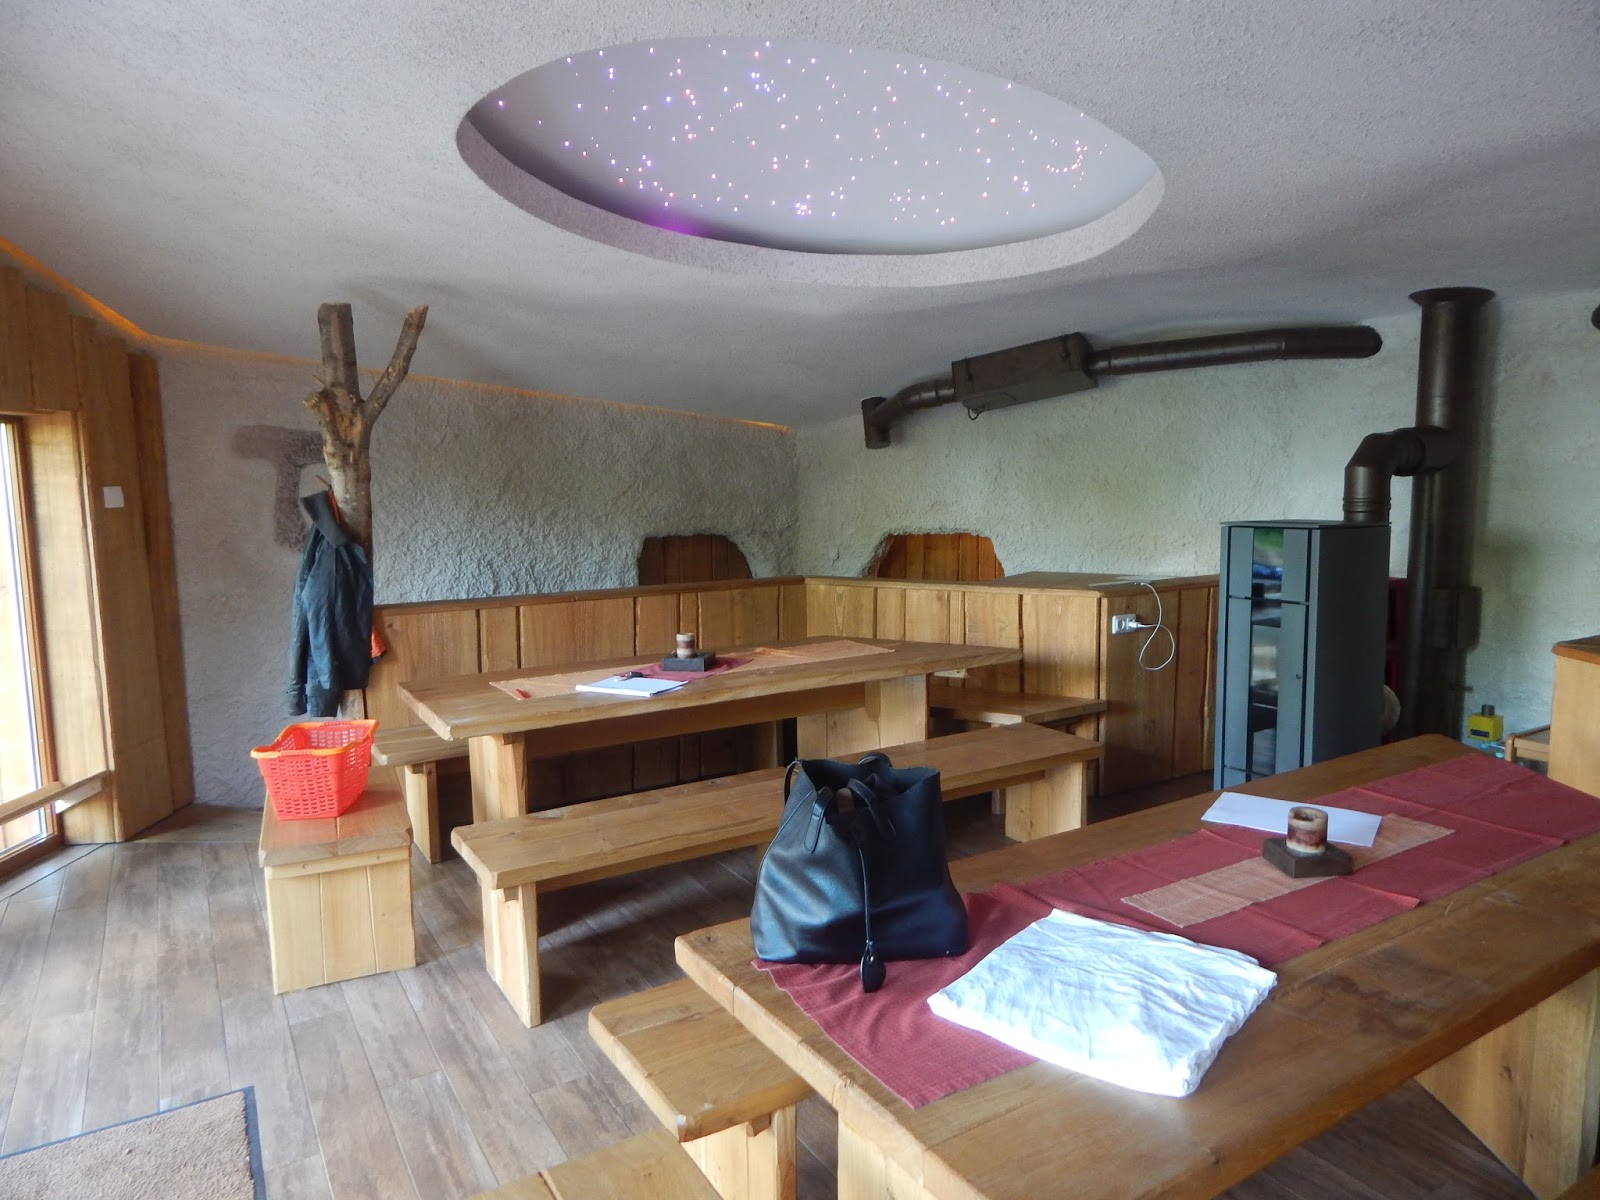 Erdhaus Innen freiwillige feuerwehr sommerhausen juni 2016